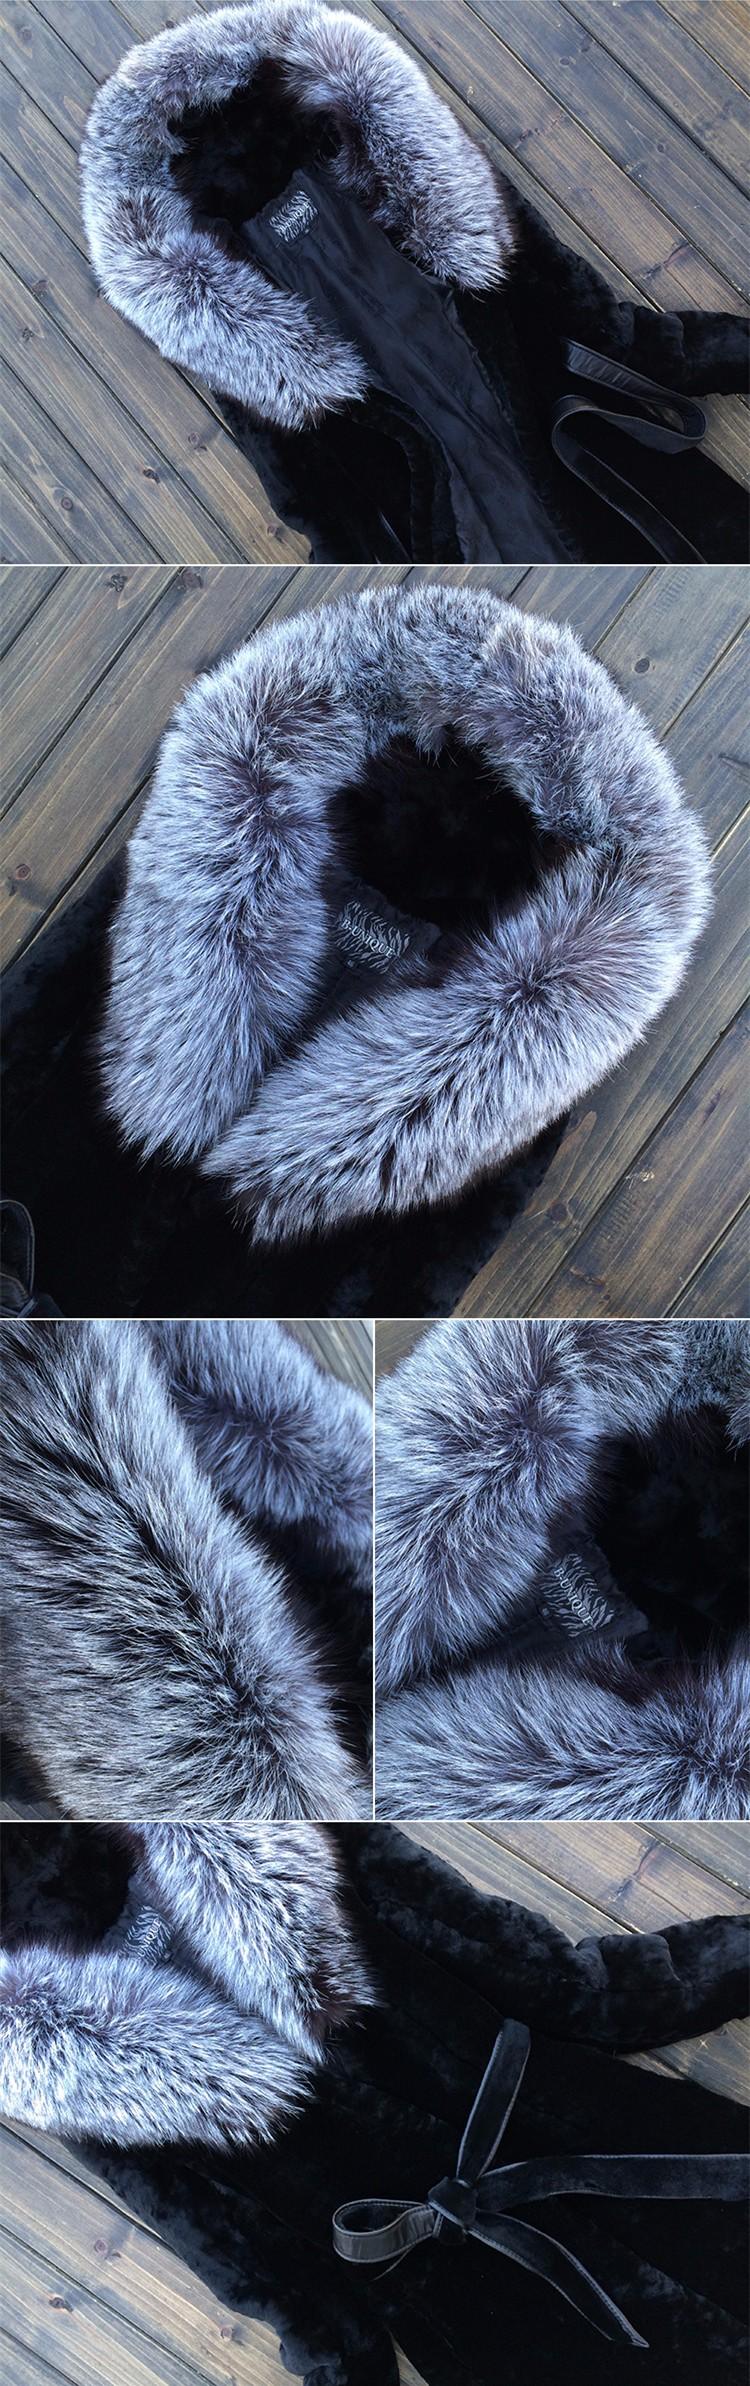 2016 Women's Winter Fur Coat Female Outwear Top Artificial Rabbit Fur Jacket With Fur Collar Long Design Thick Warm Size S-6XL